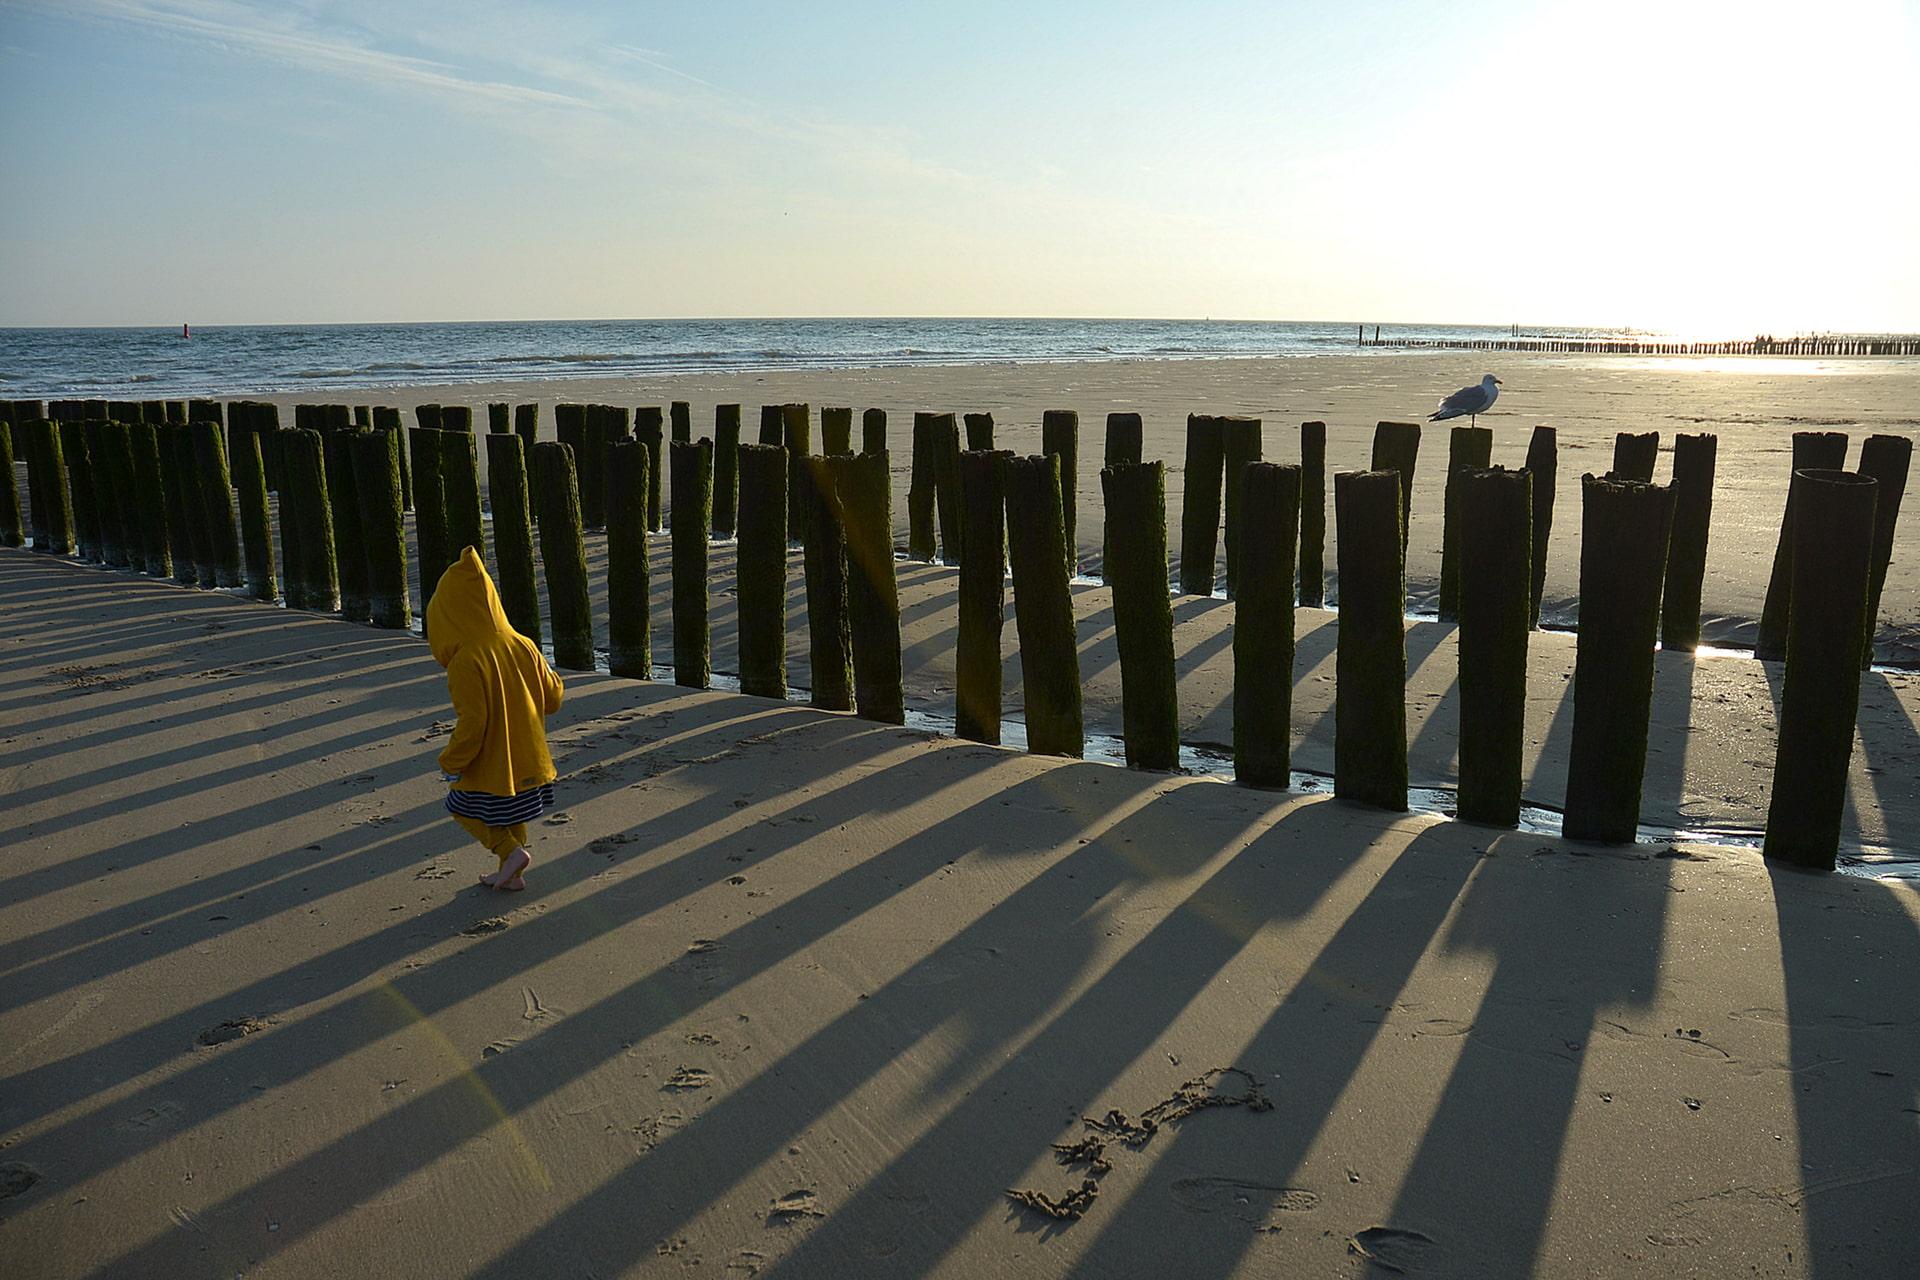 Natur, Mädchen, Strand, Meer, Fotografien, Silke Berg, Offenburg, Nordsee, Fotografin,